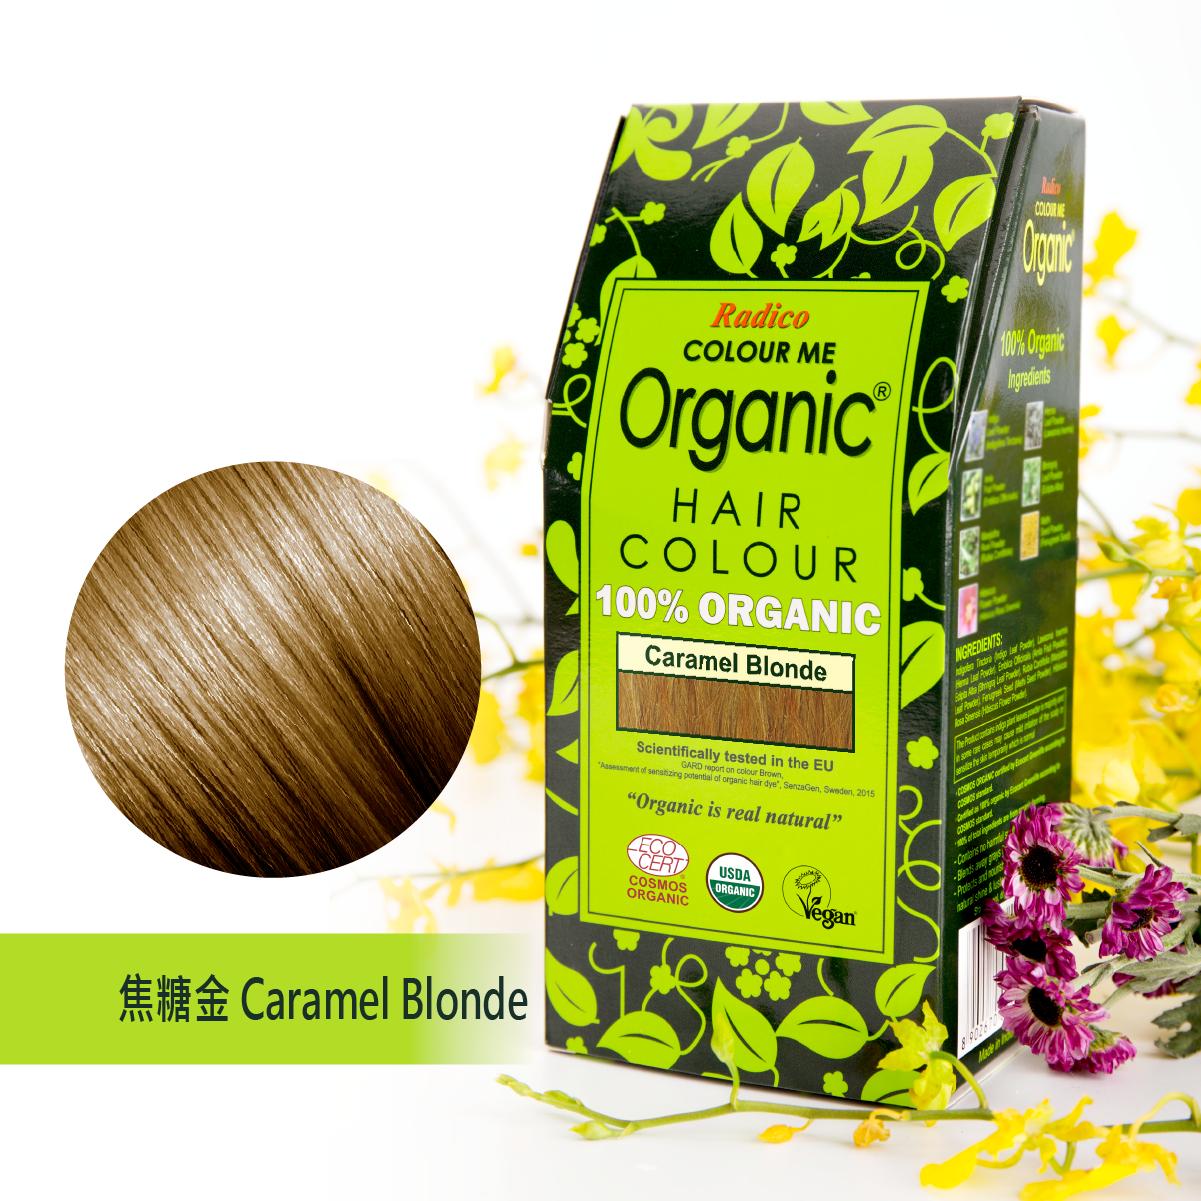 Radico Organic Hair Colour - Caramel Blonde